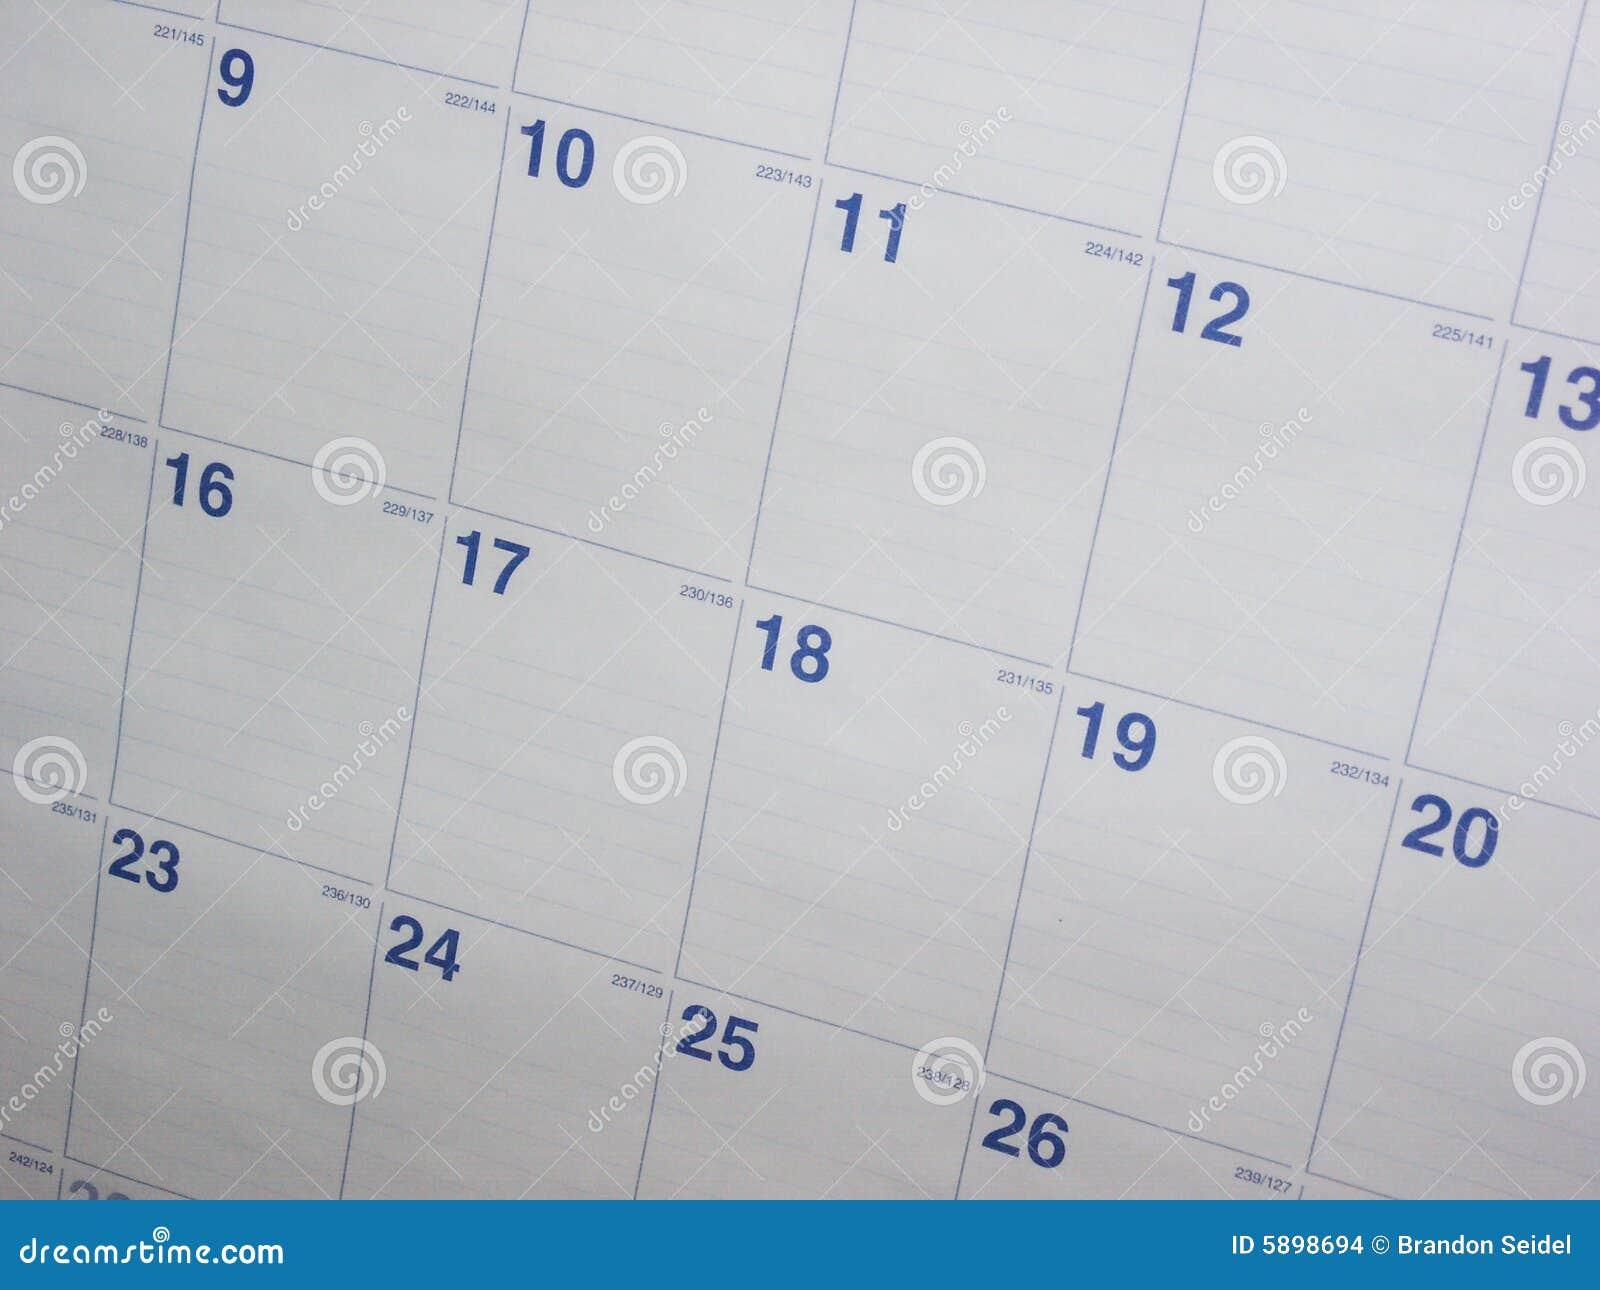 Calendar Background Stock Images - Image: 5898694